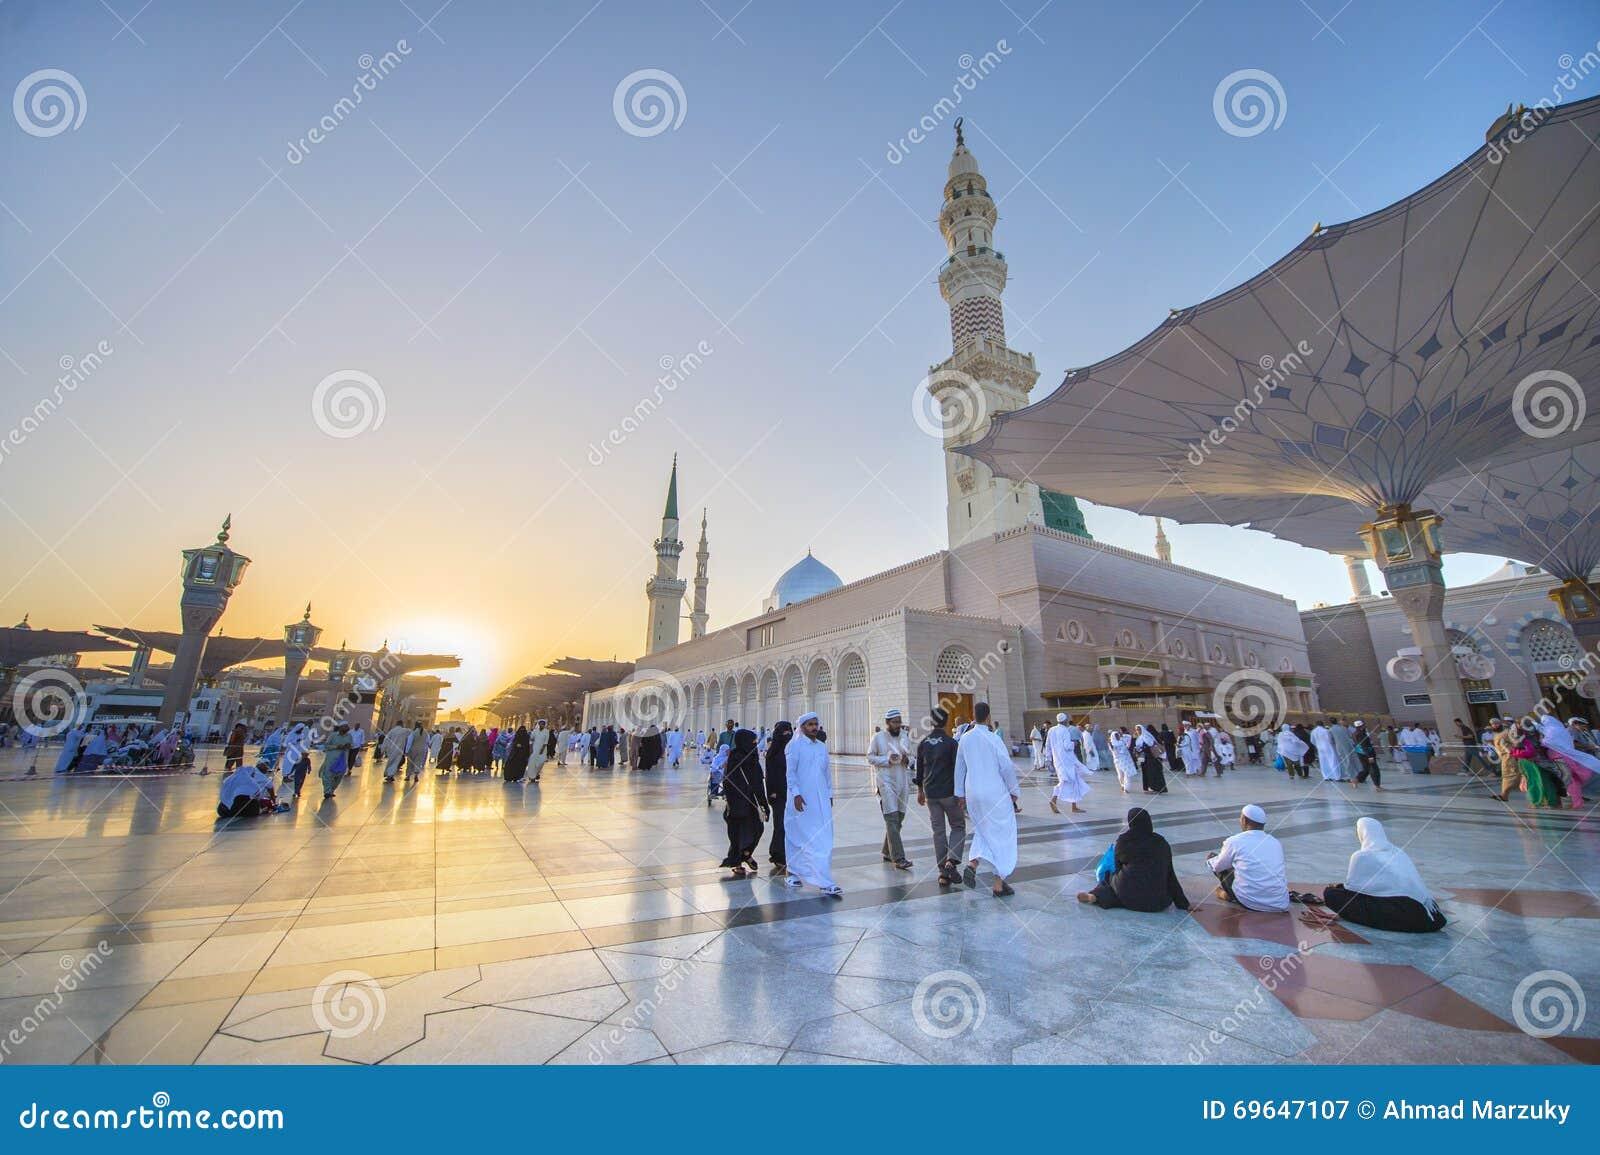 medina saudi arabia ksa march 21 sunset at nabawi mosque